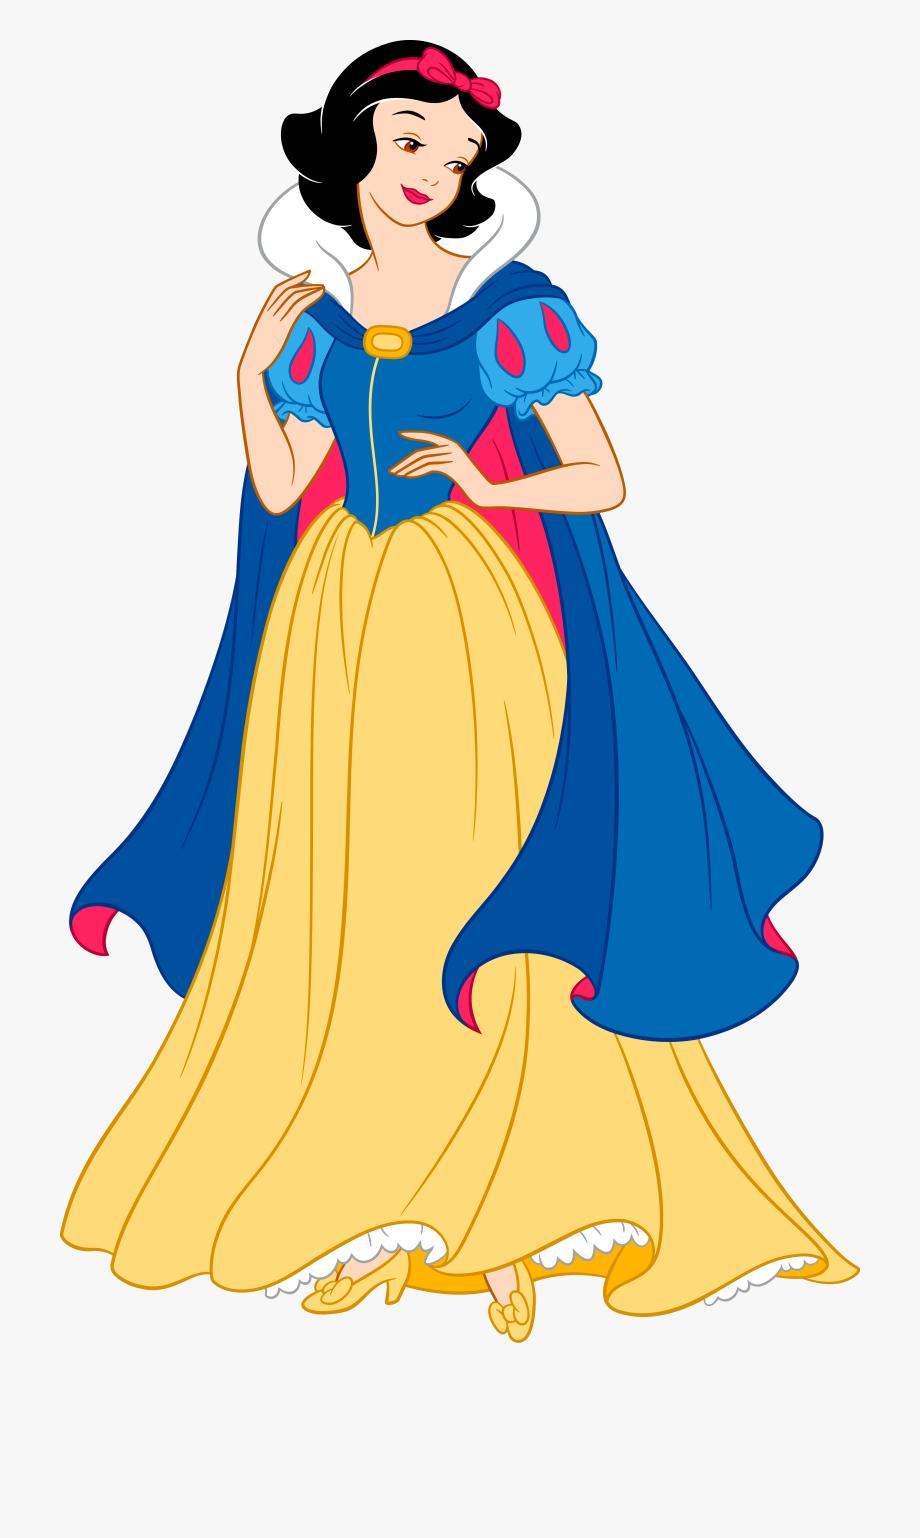 Free cinderella clipart graphic black and white stock Png Download - Disney Princess Cinderella Clipart #75402 - Free ... graphic black and white stock